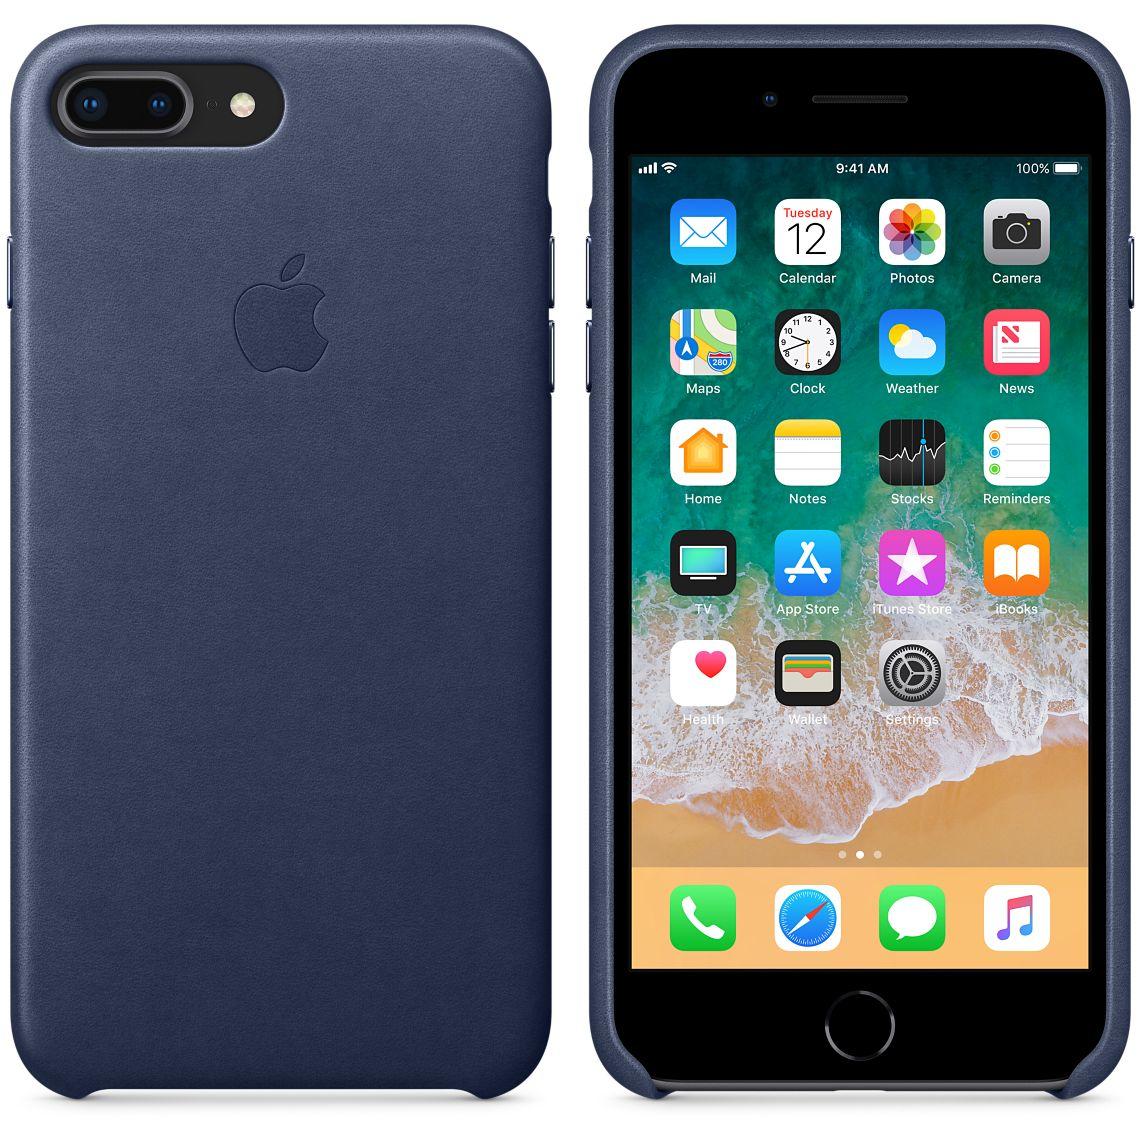 Capa de couro para iPhone 8 Plus/7 Plus - Azul meia‑noite